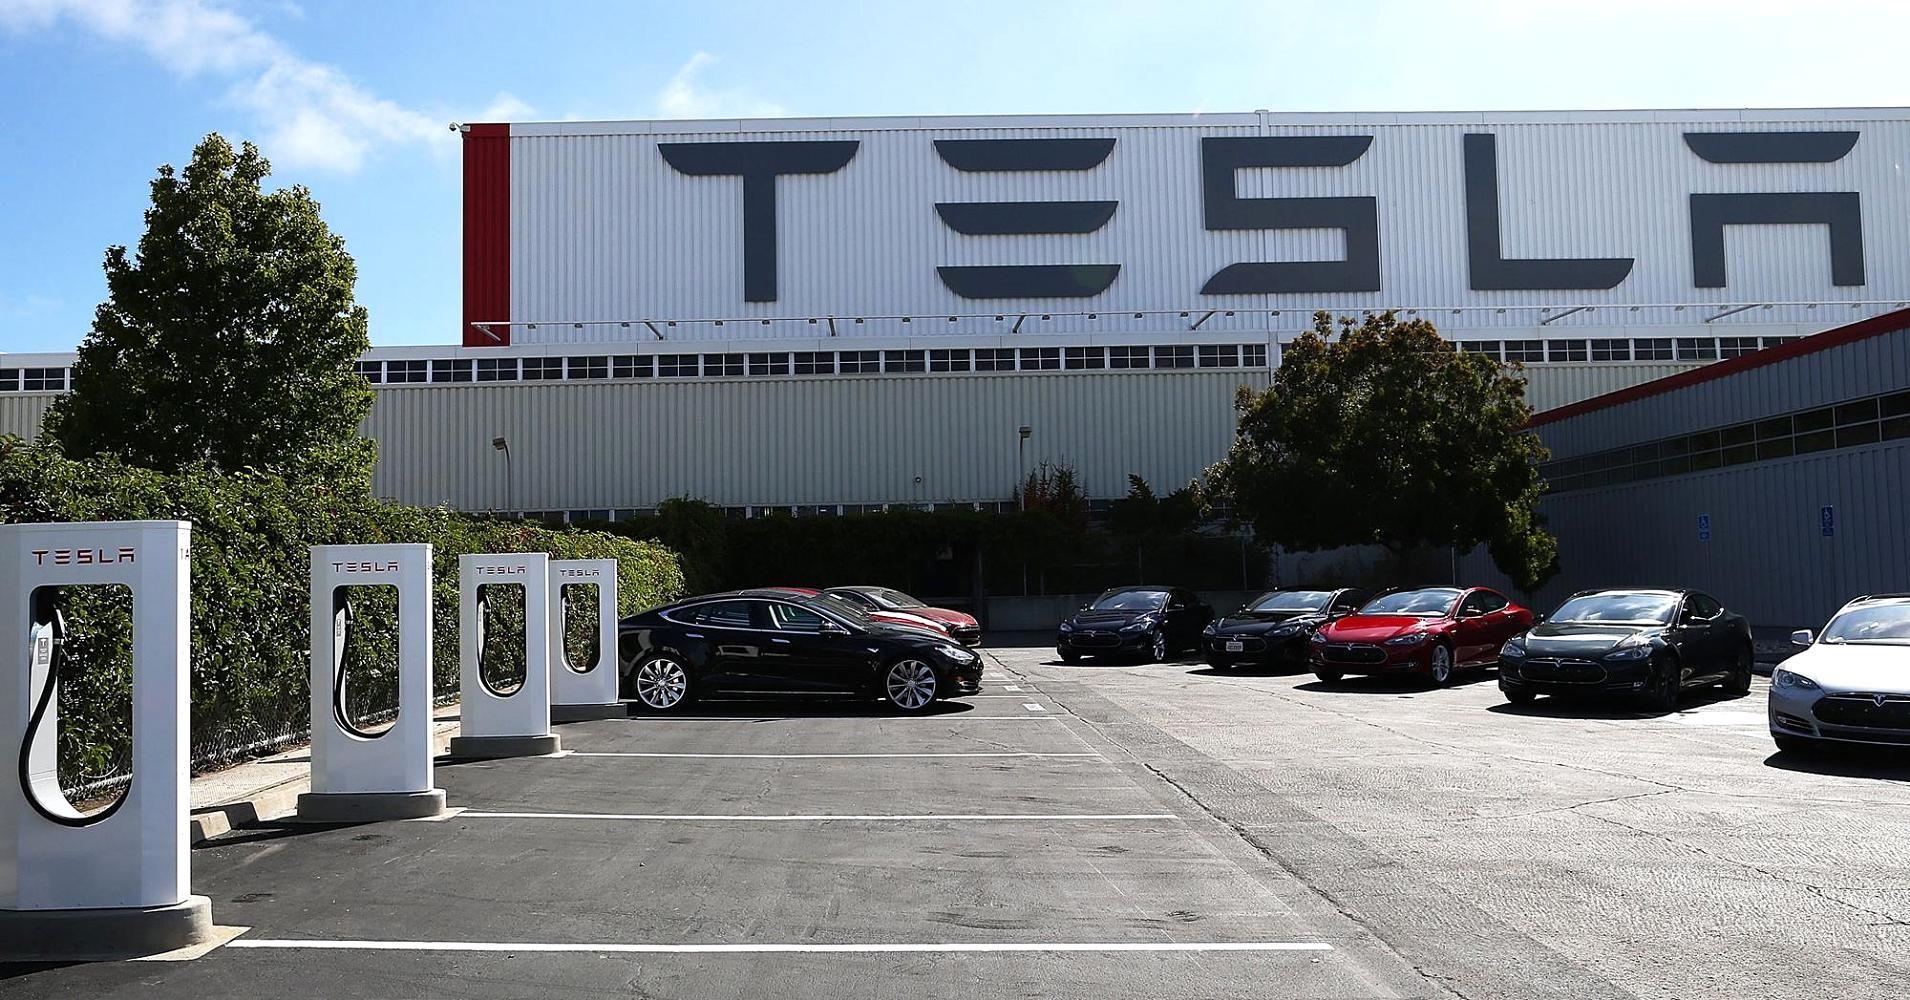 Tesla, difficoltà produttive e incidenti inspiegabili: la colpa è di un sabotatore